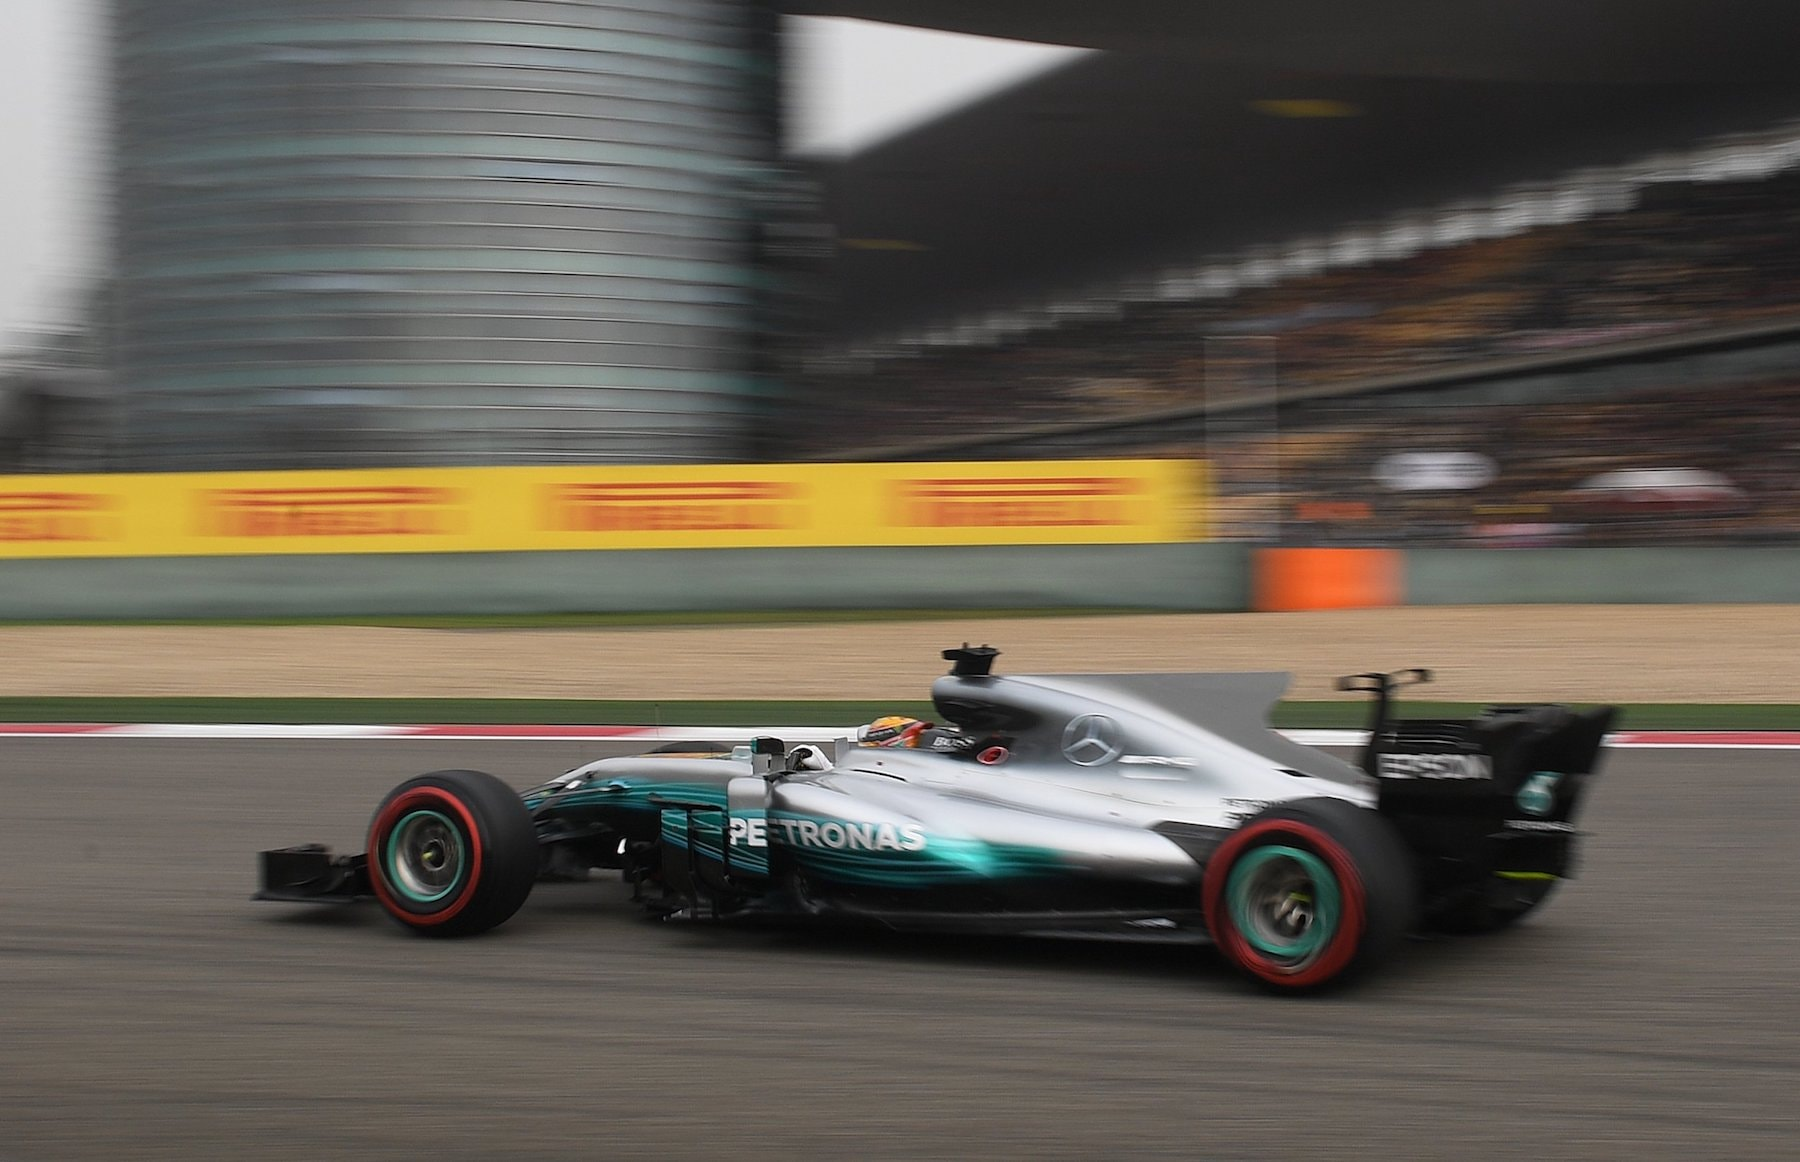 2017 Lewis Hamilton | Mercedes W08 | 2017 Chinese GP Pole 3 copy.jpg